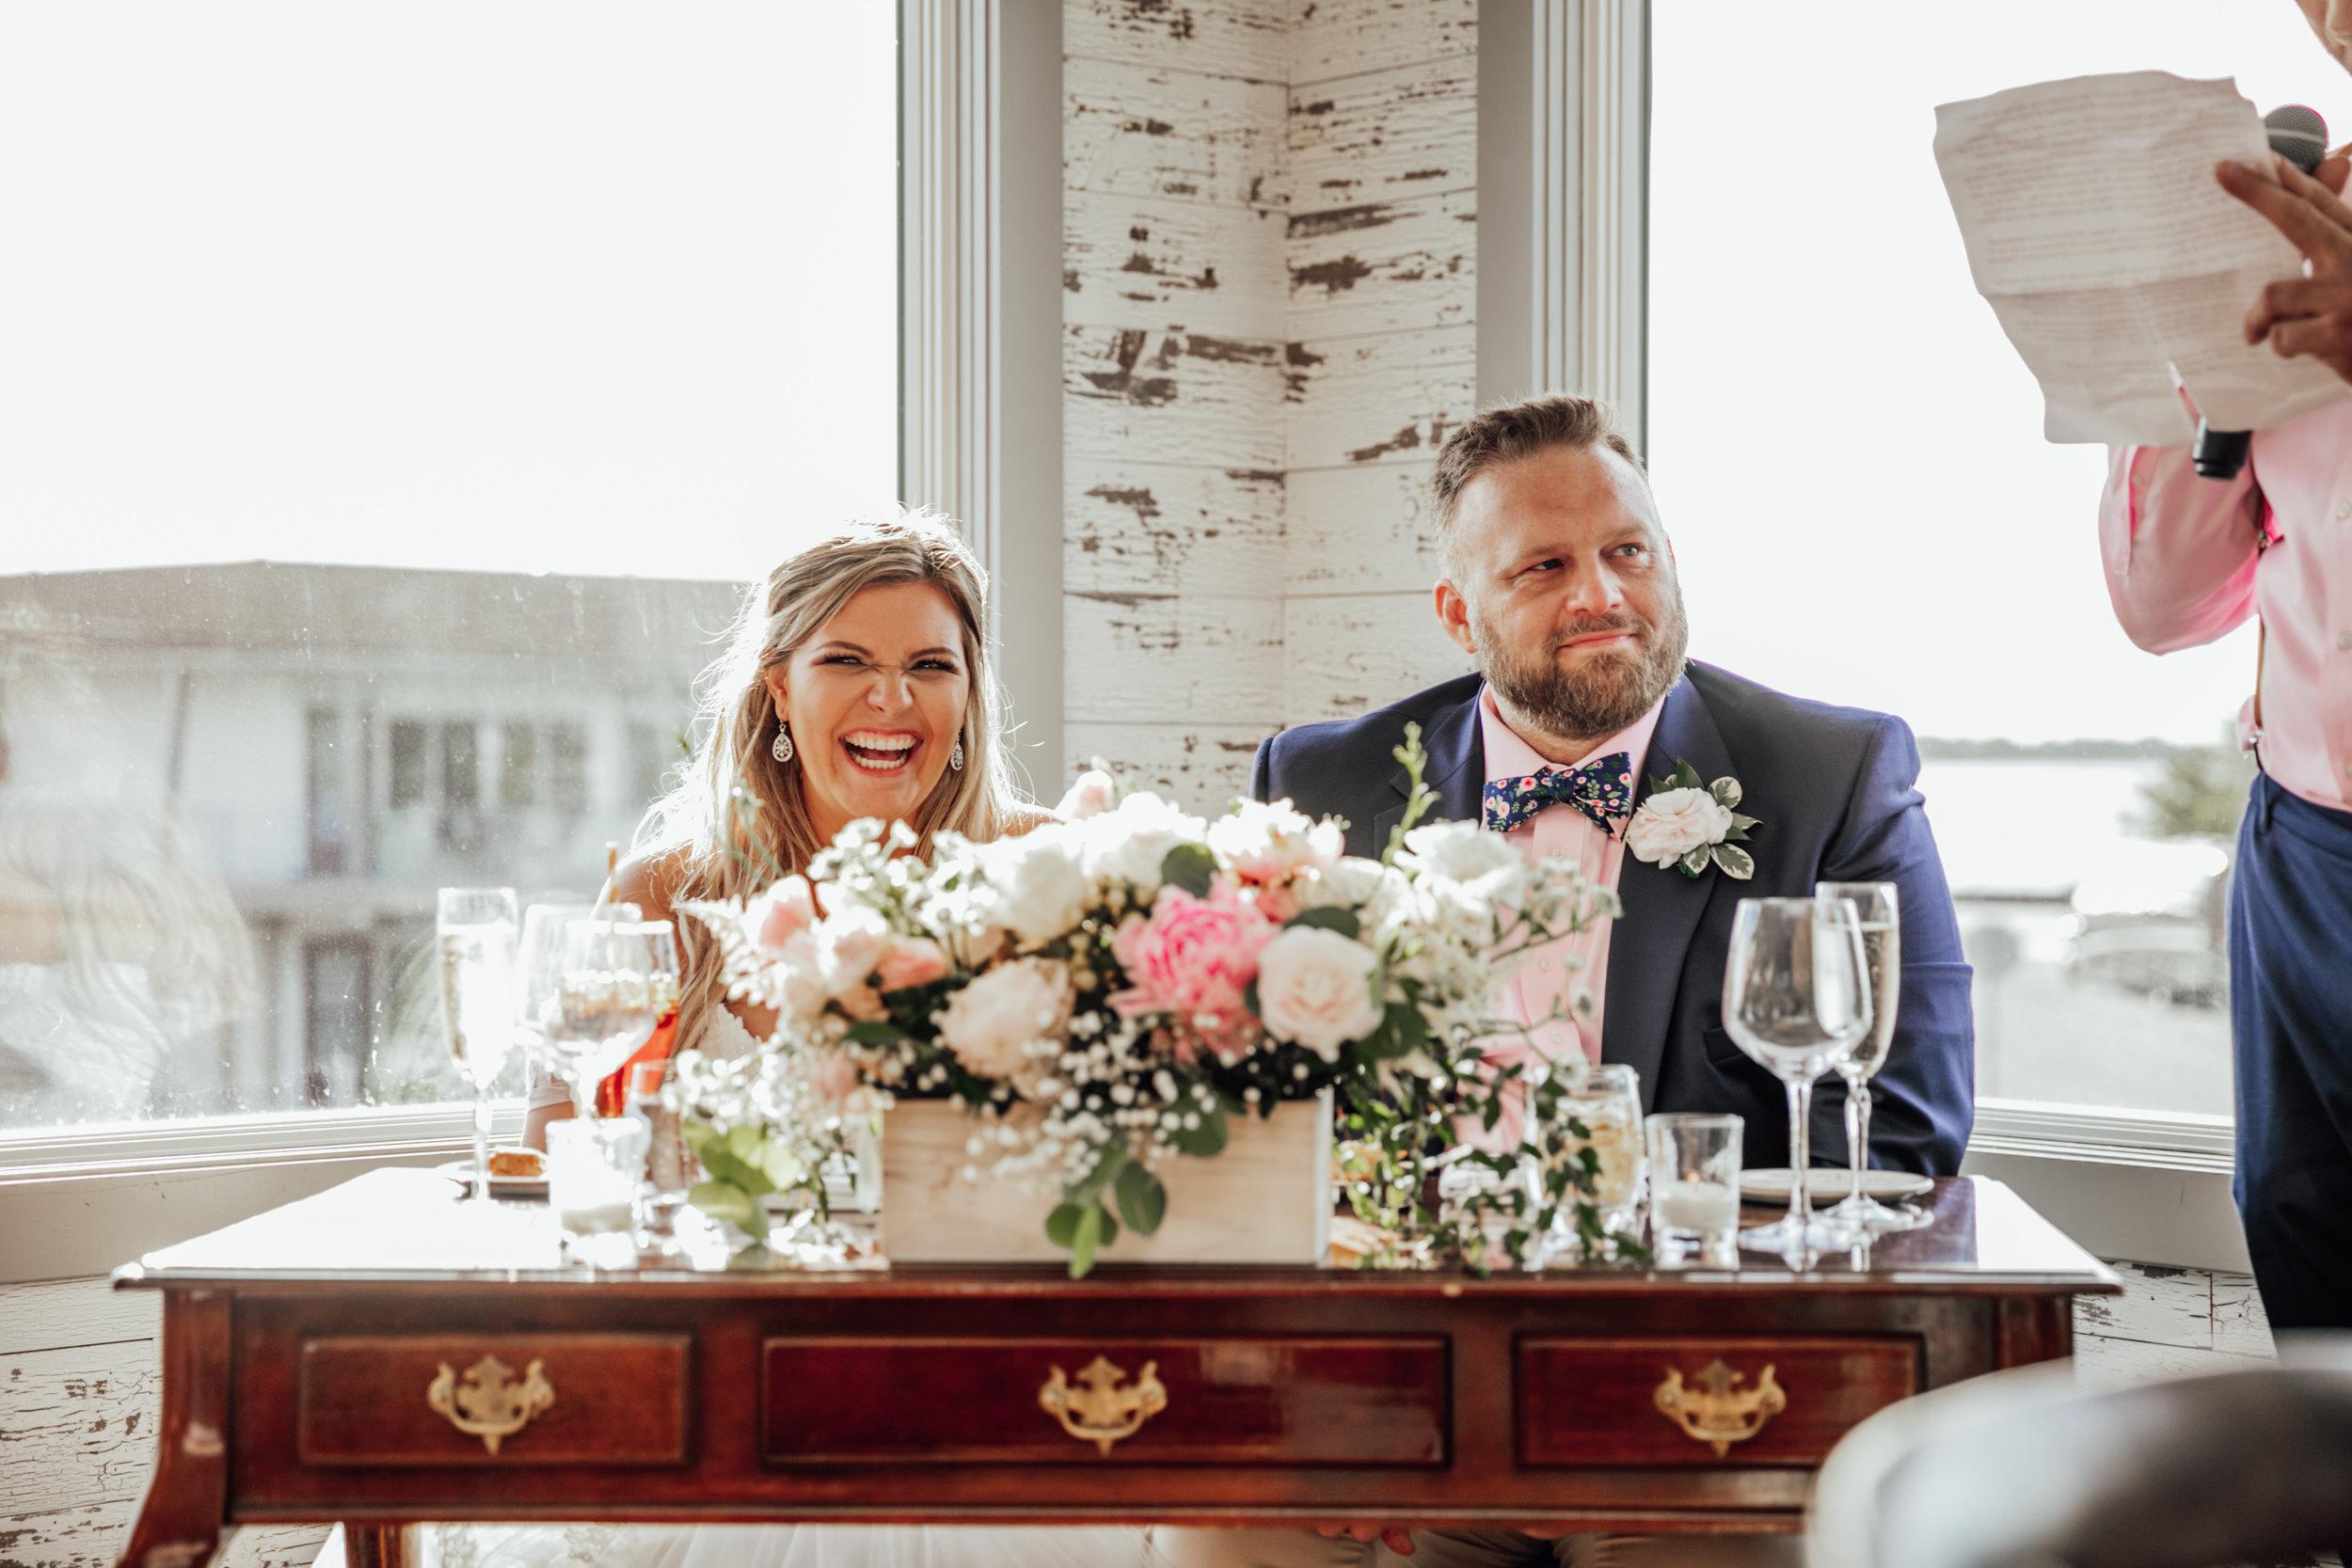 New Jersey Wedding Photographer, Felsberg Photography LBI wedding photography 105.jpg